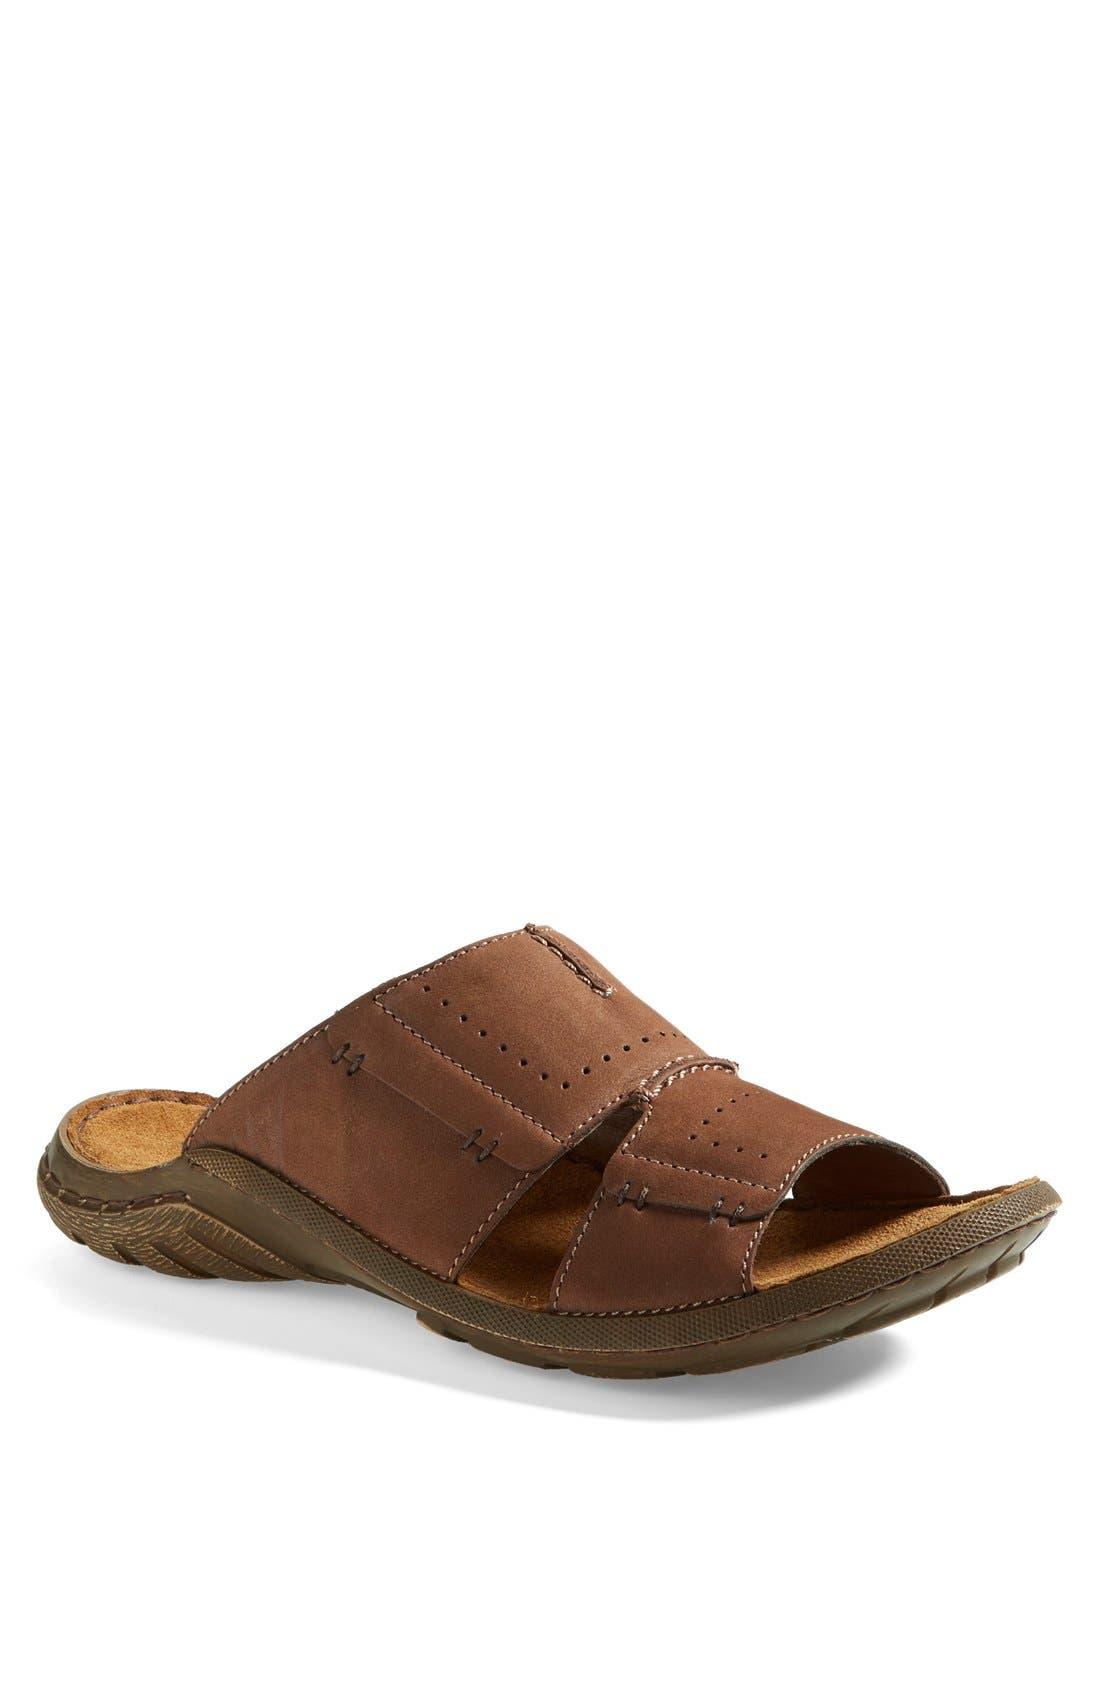 'Logan 21' Slide Sandal,                             Main thumbnail 1, color,                             241